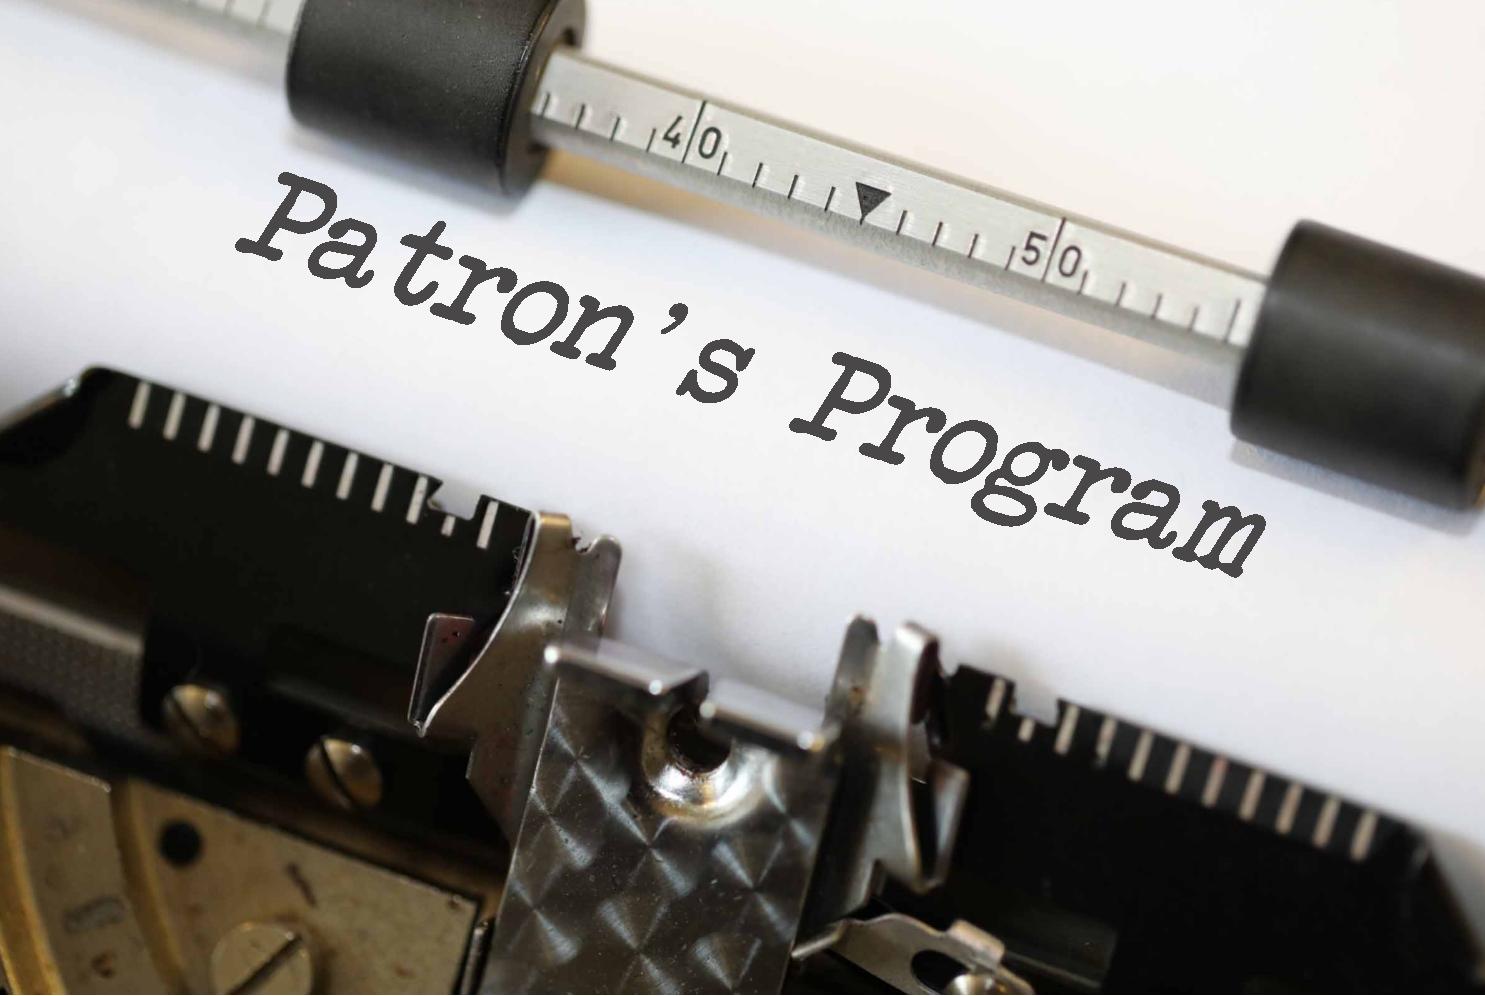 patronsprogram.png